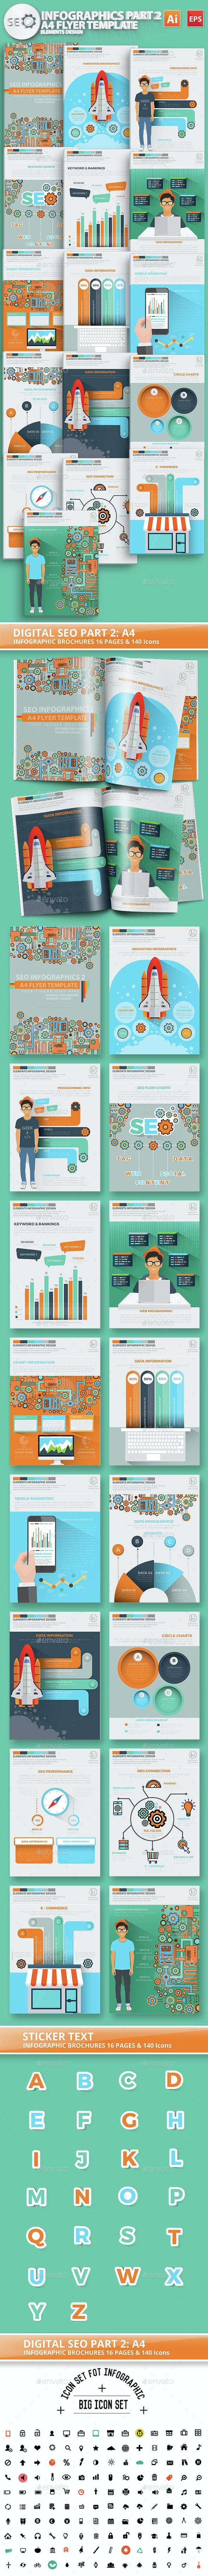 Digital SEO Infographic Design 2 - Infographics